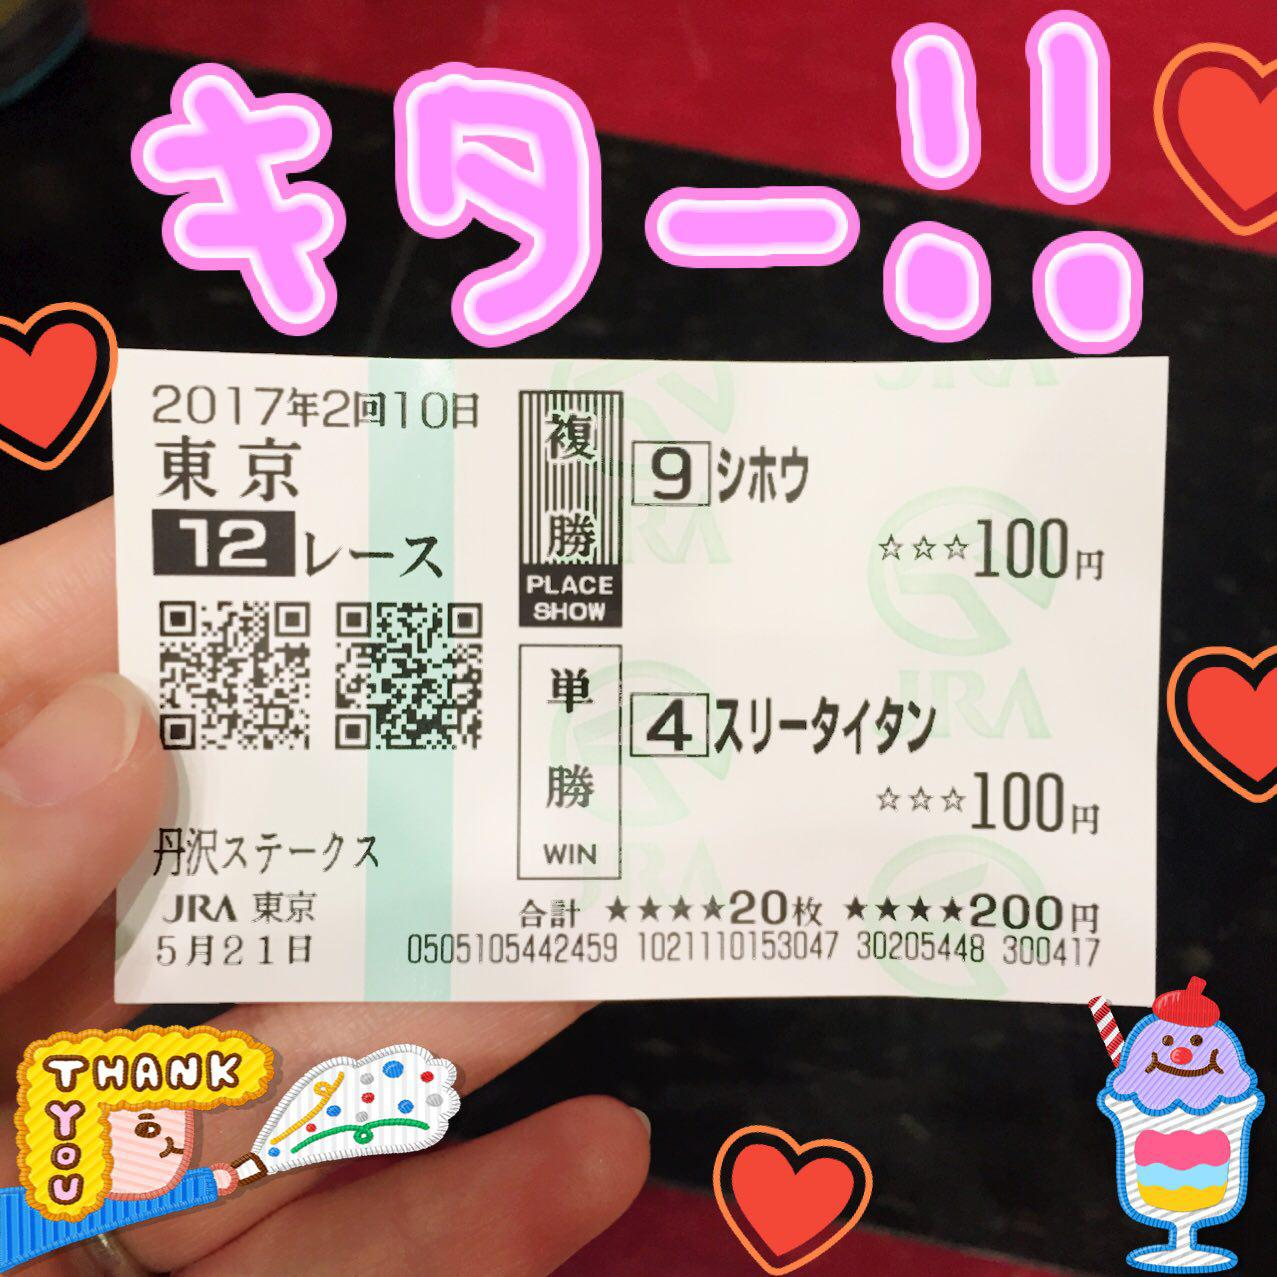 photo_2017-05-21_21-48-08.jpg